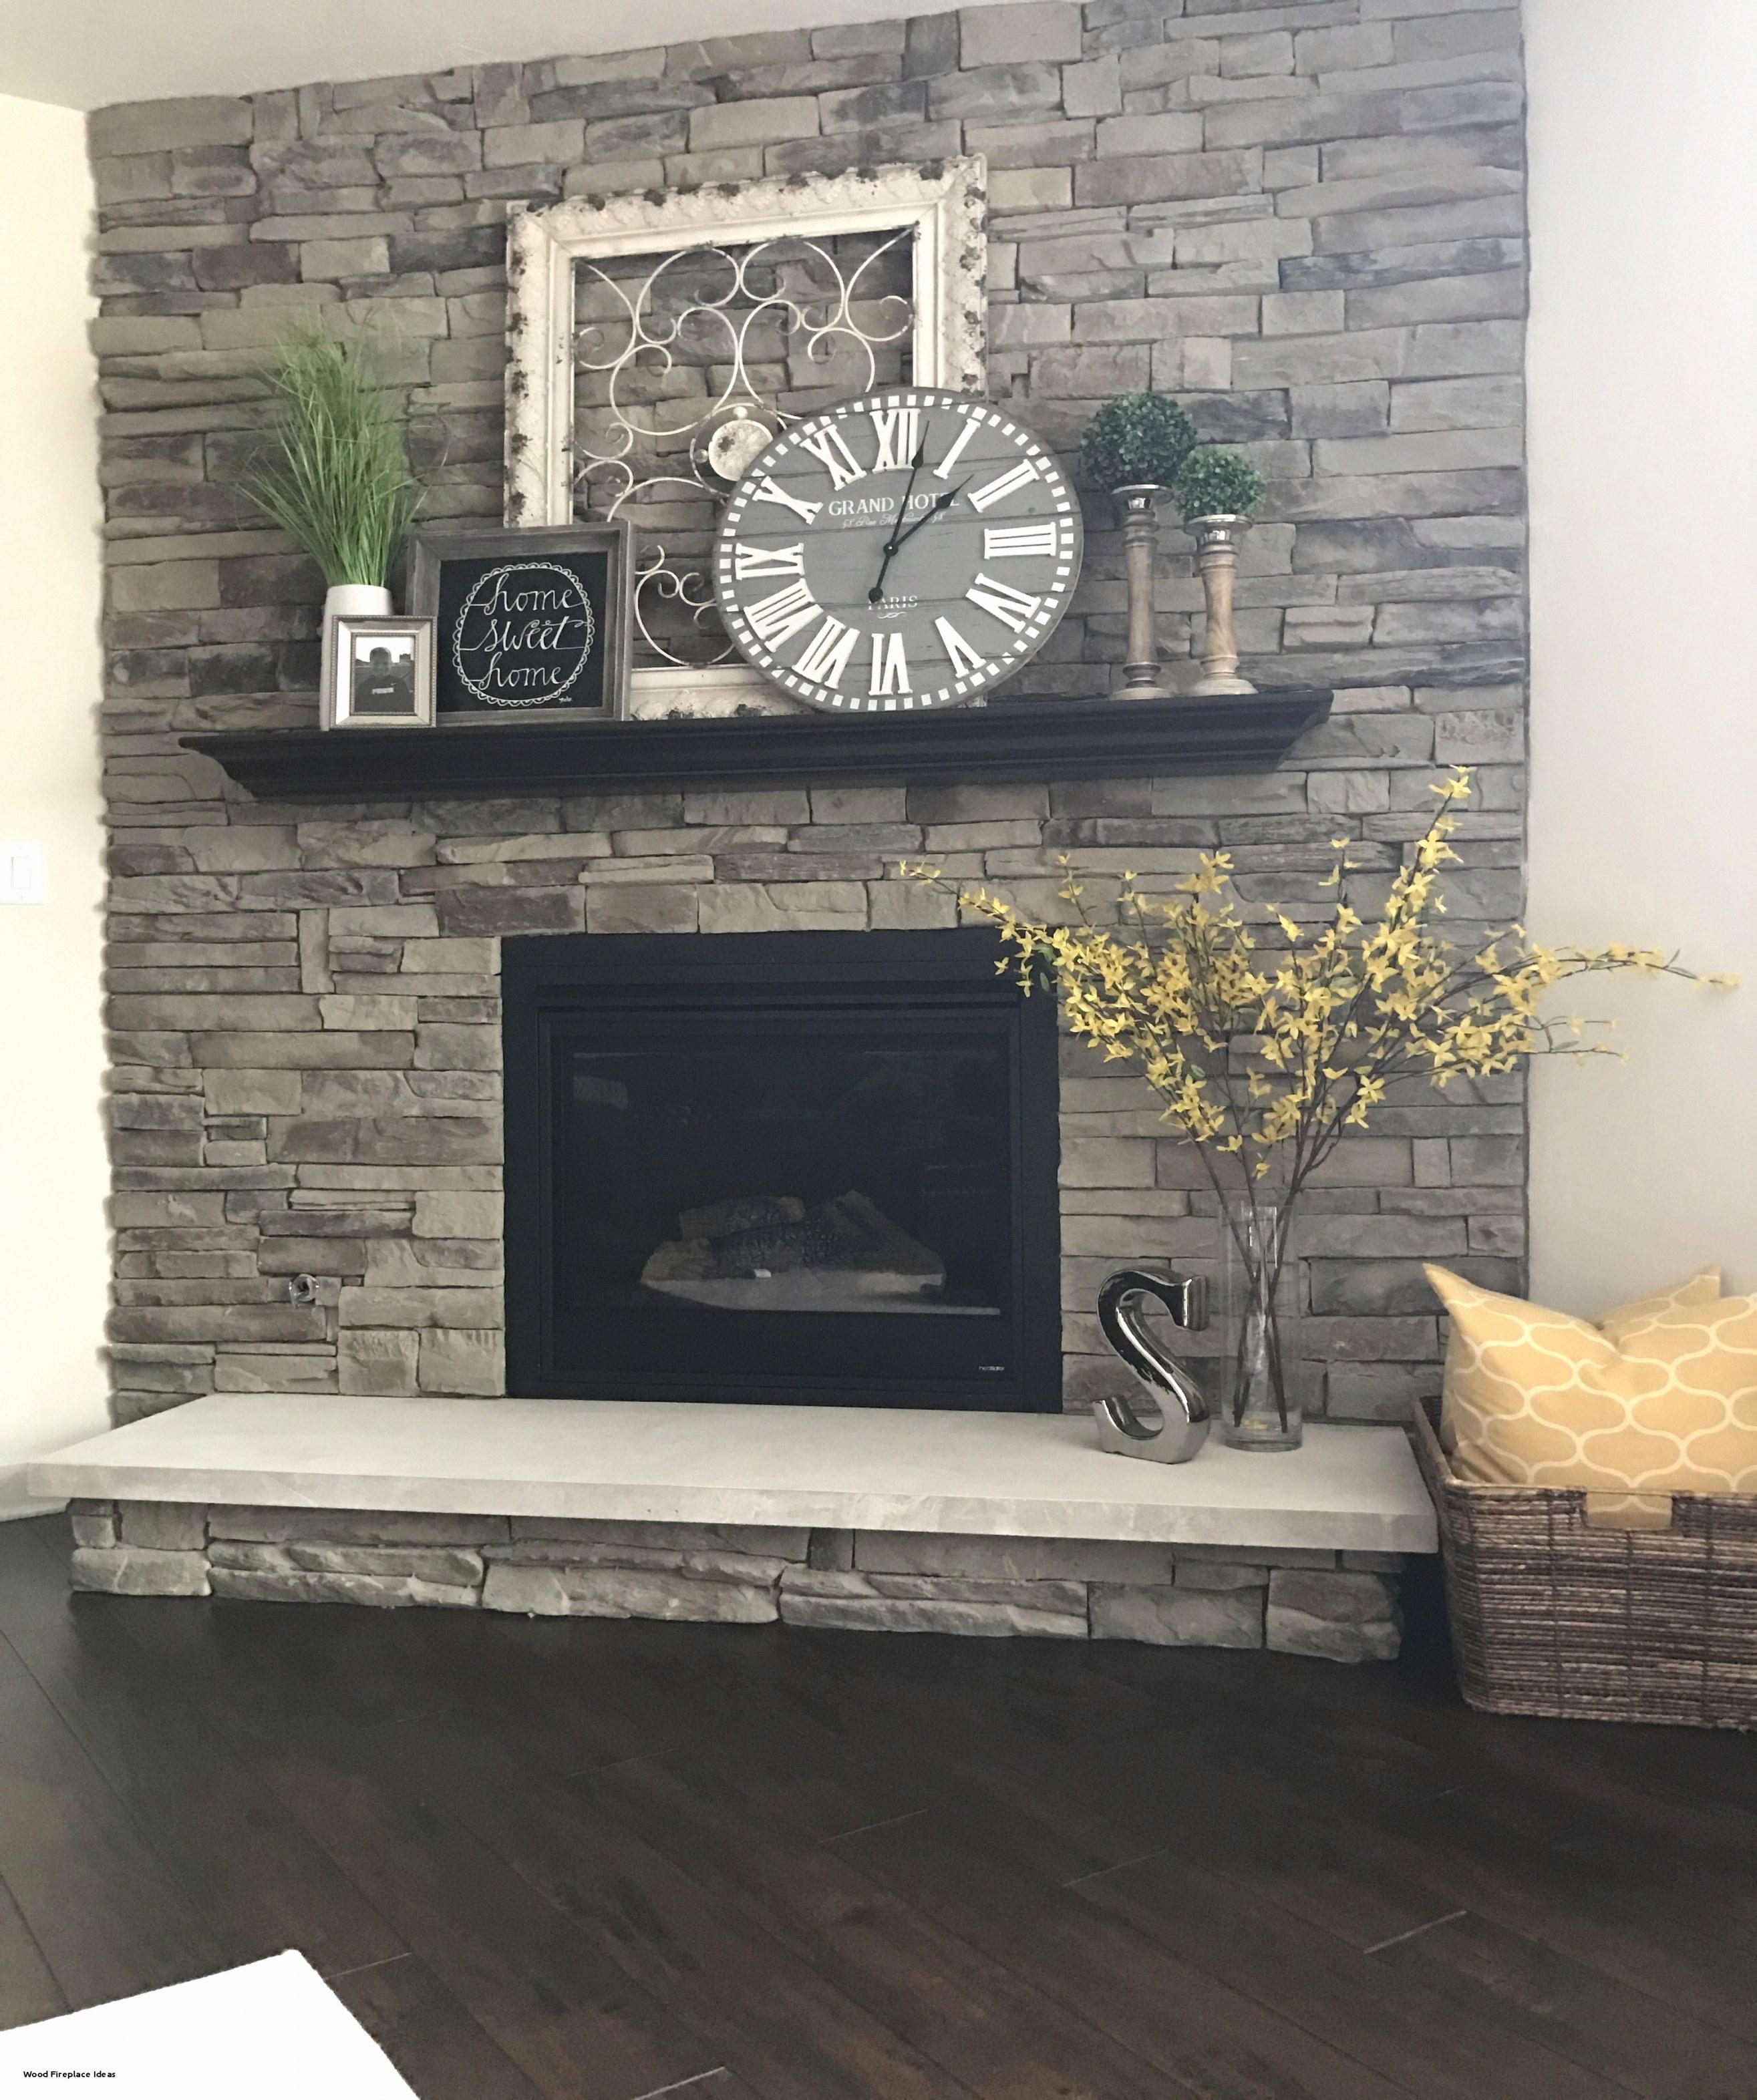 contemporary fireplace ideas 38 wood fireplace ideas finedestfo of contemporary fireplace ideas 1